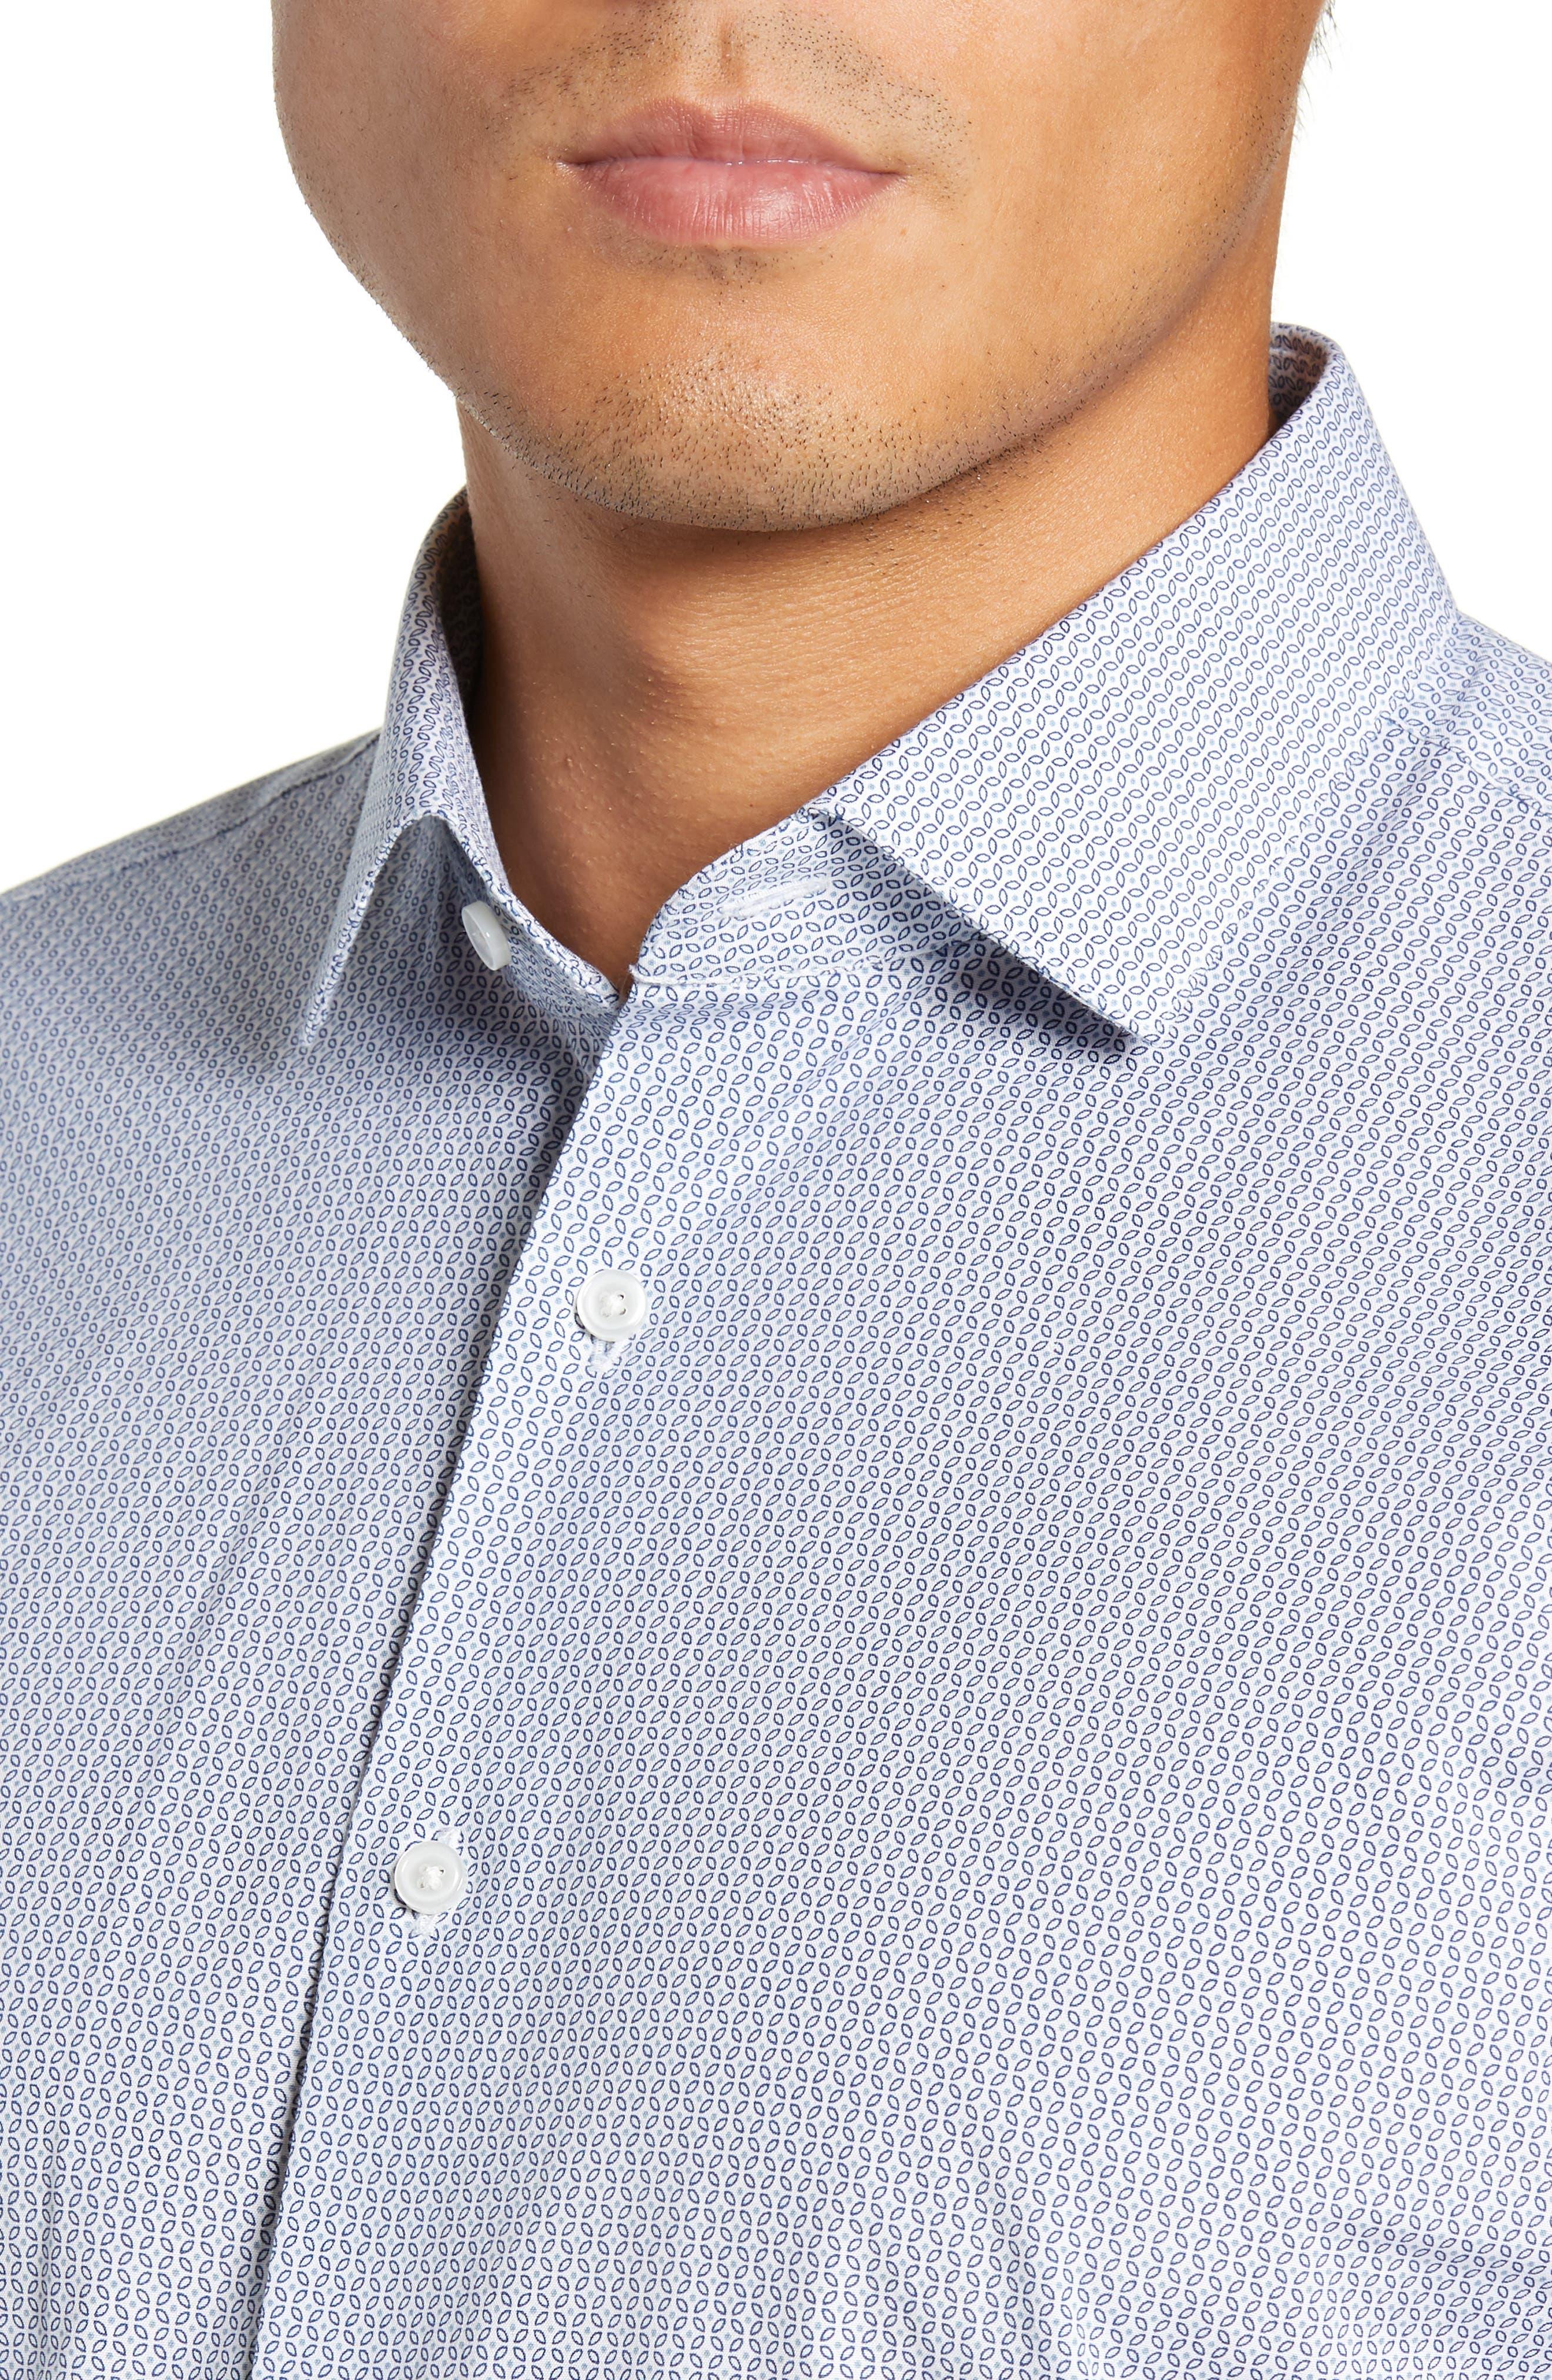 Trim Fit Geometric Print Dress Shirt,                             Alternate thumbnail 2, color,                             BLUE CHAMBRAY